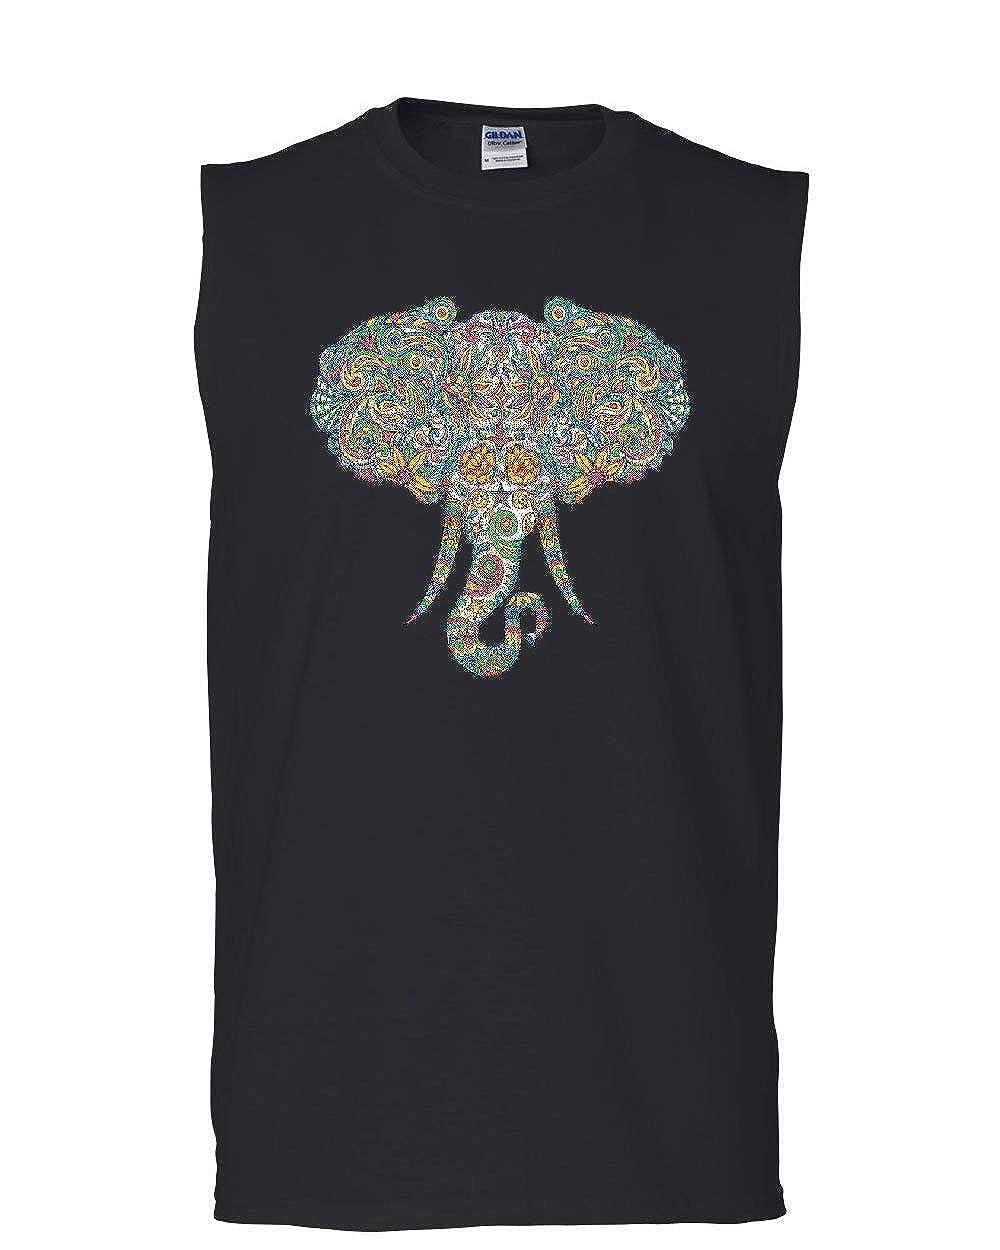 Mosaic Elephant Muscle Shirt Art Pastel Henna Ornament Wildlife Trunk Sleeveless